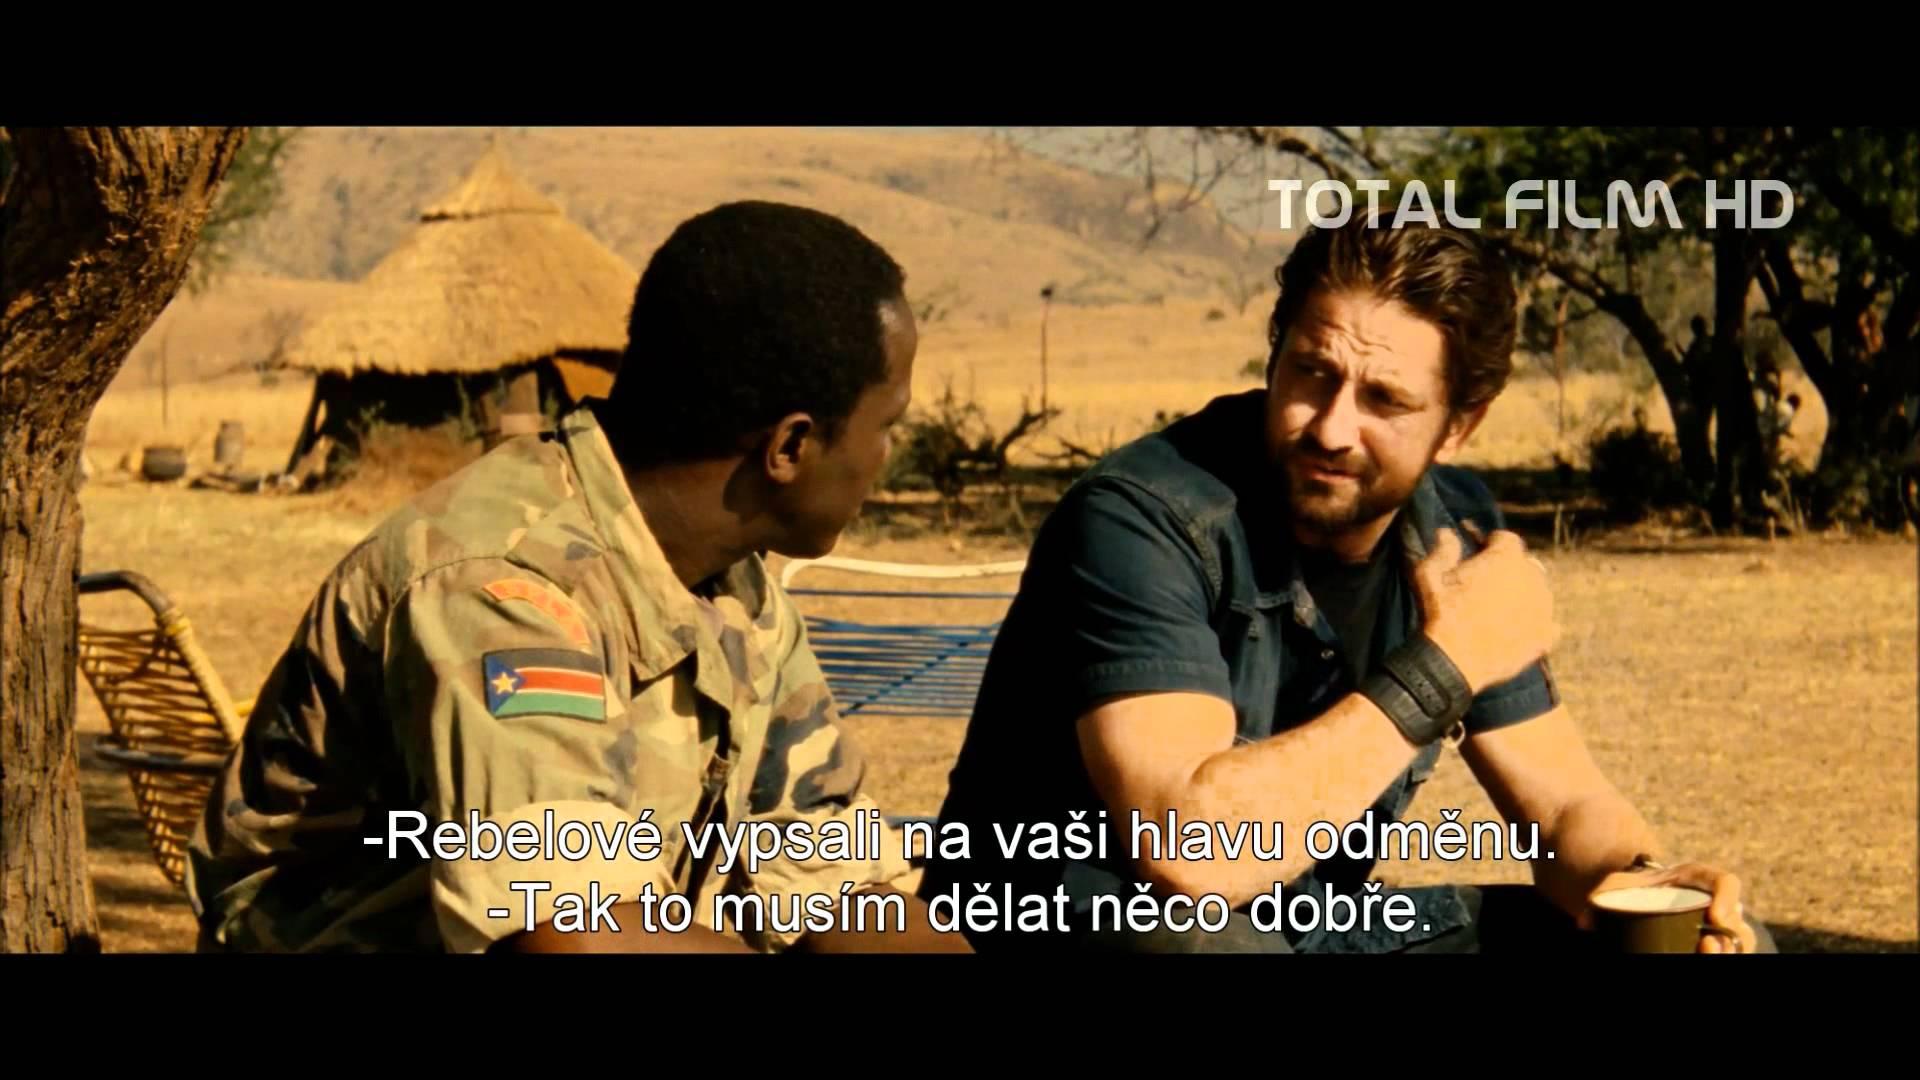 KAZATEL KALAŠNIKOV / MACHINE GUN PREACHER (2011) oficiální český trailer